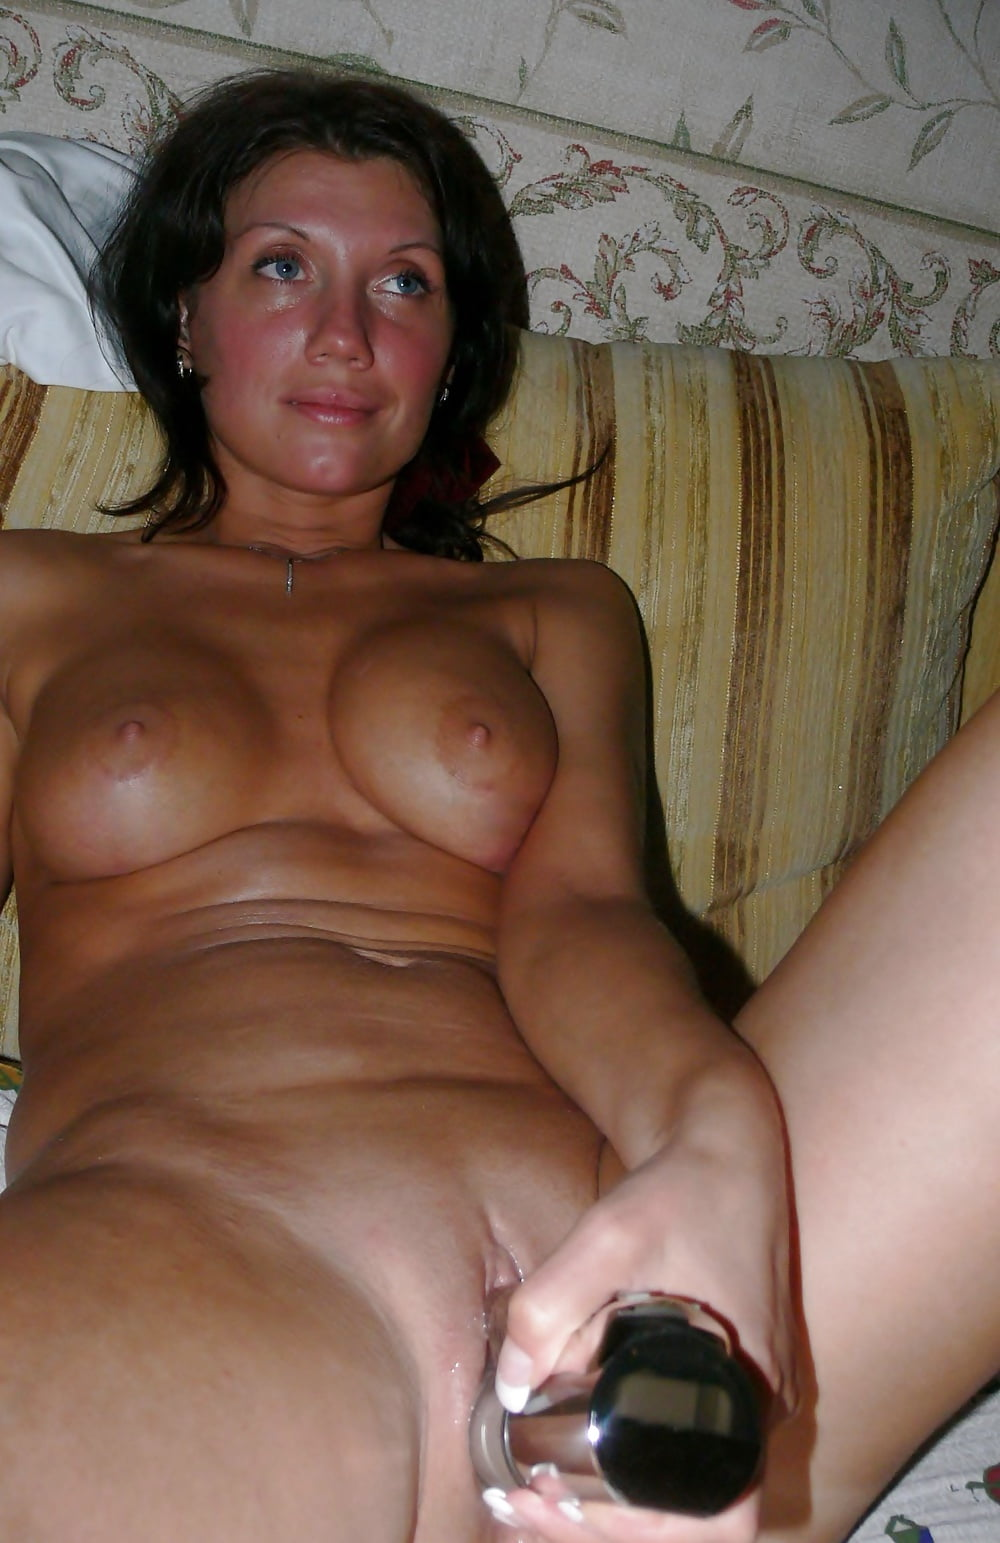 ухоженная жена русское порно - 2